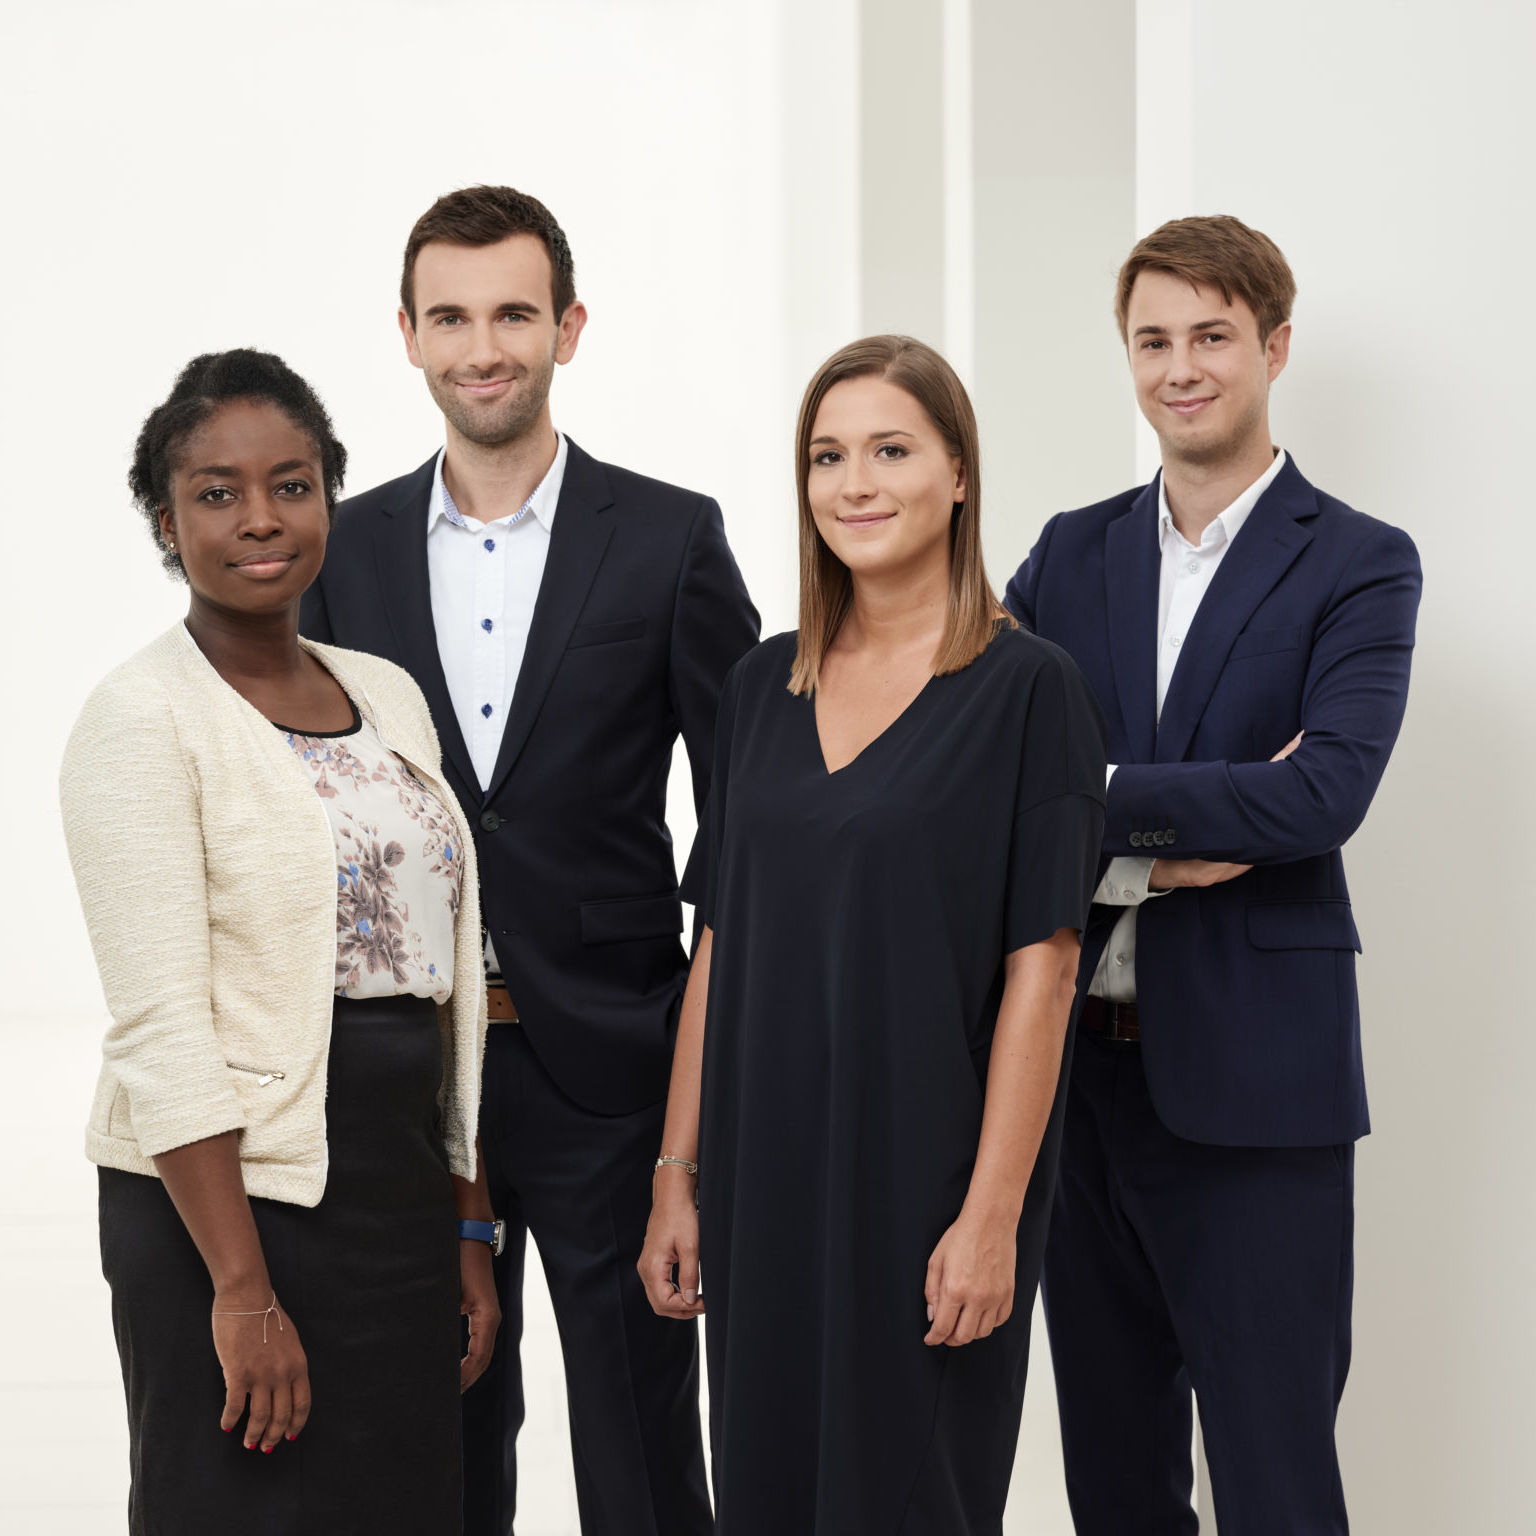 Wien Energie Public Affairs Team